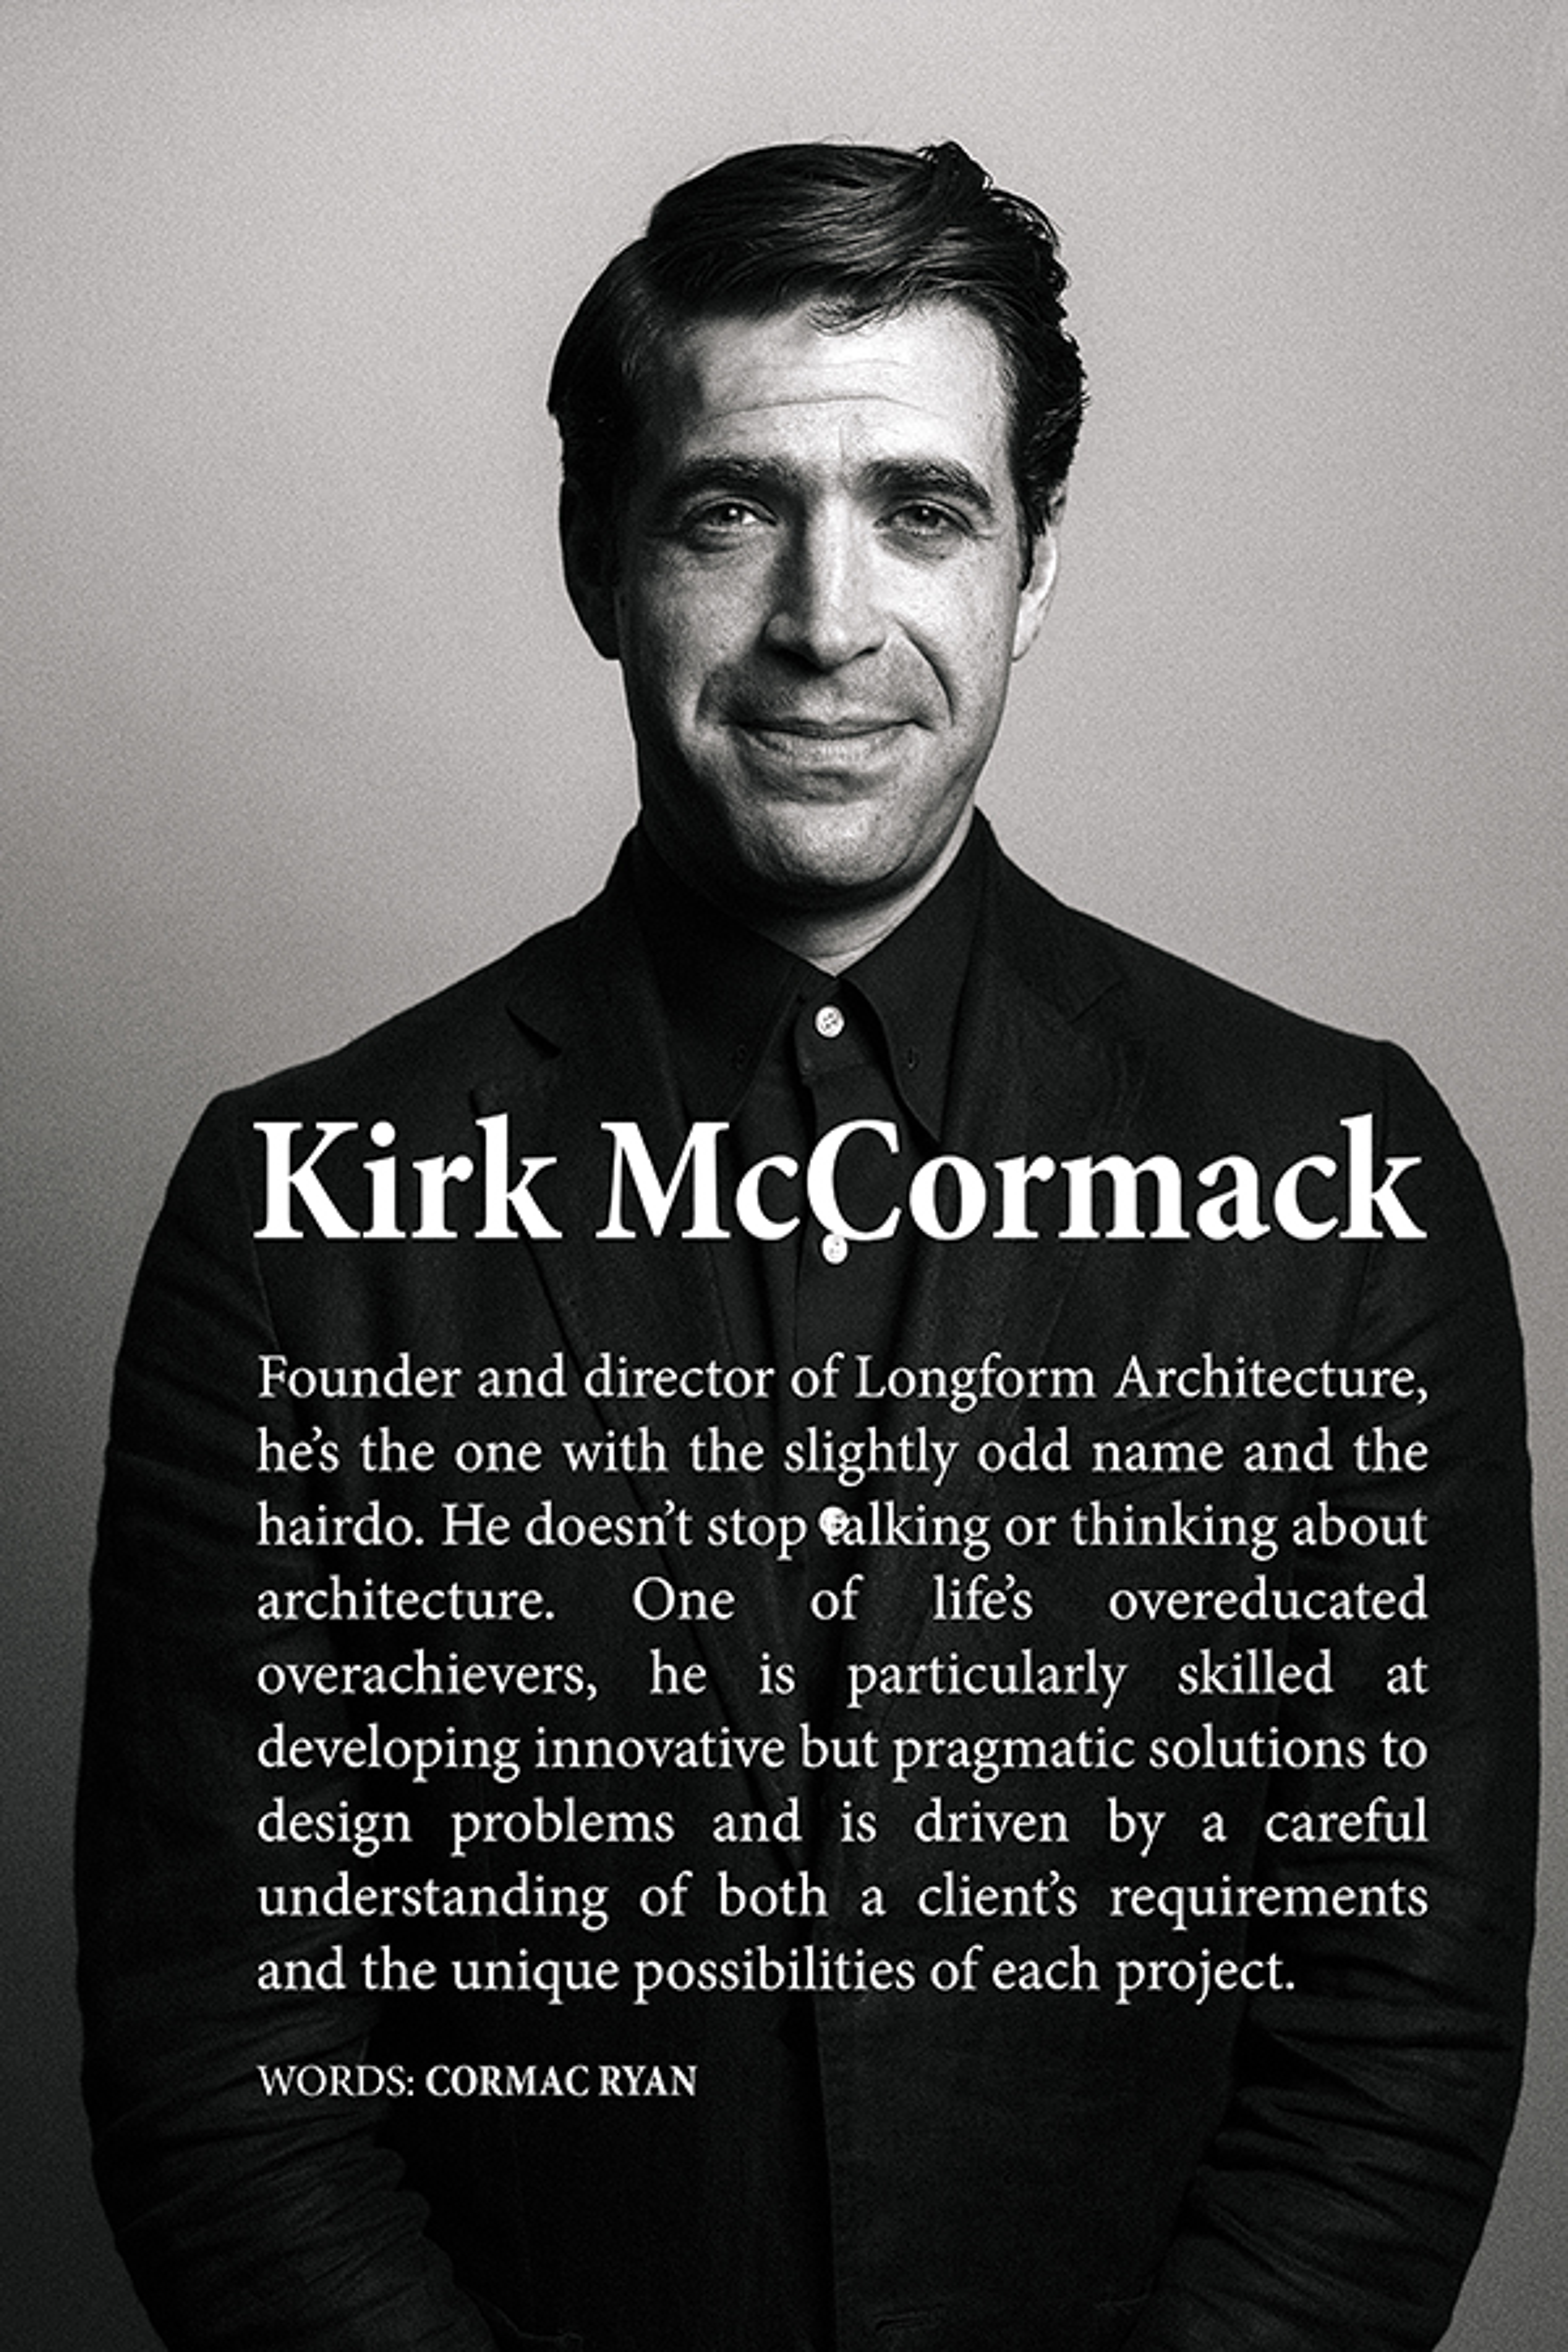 Kirk Bio Text